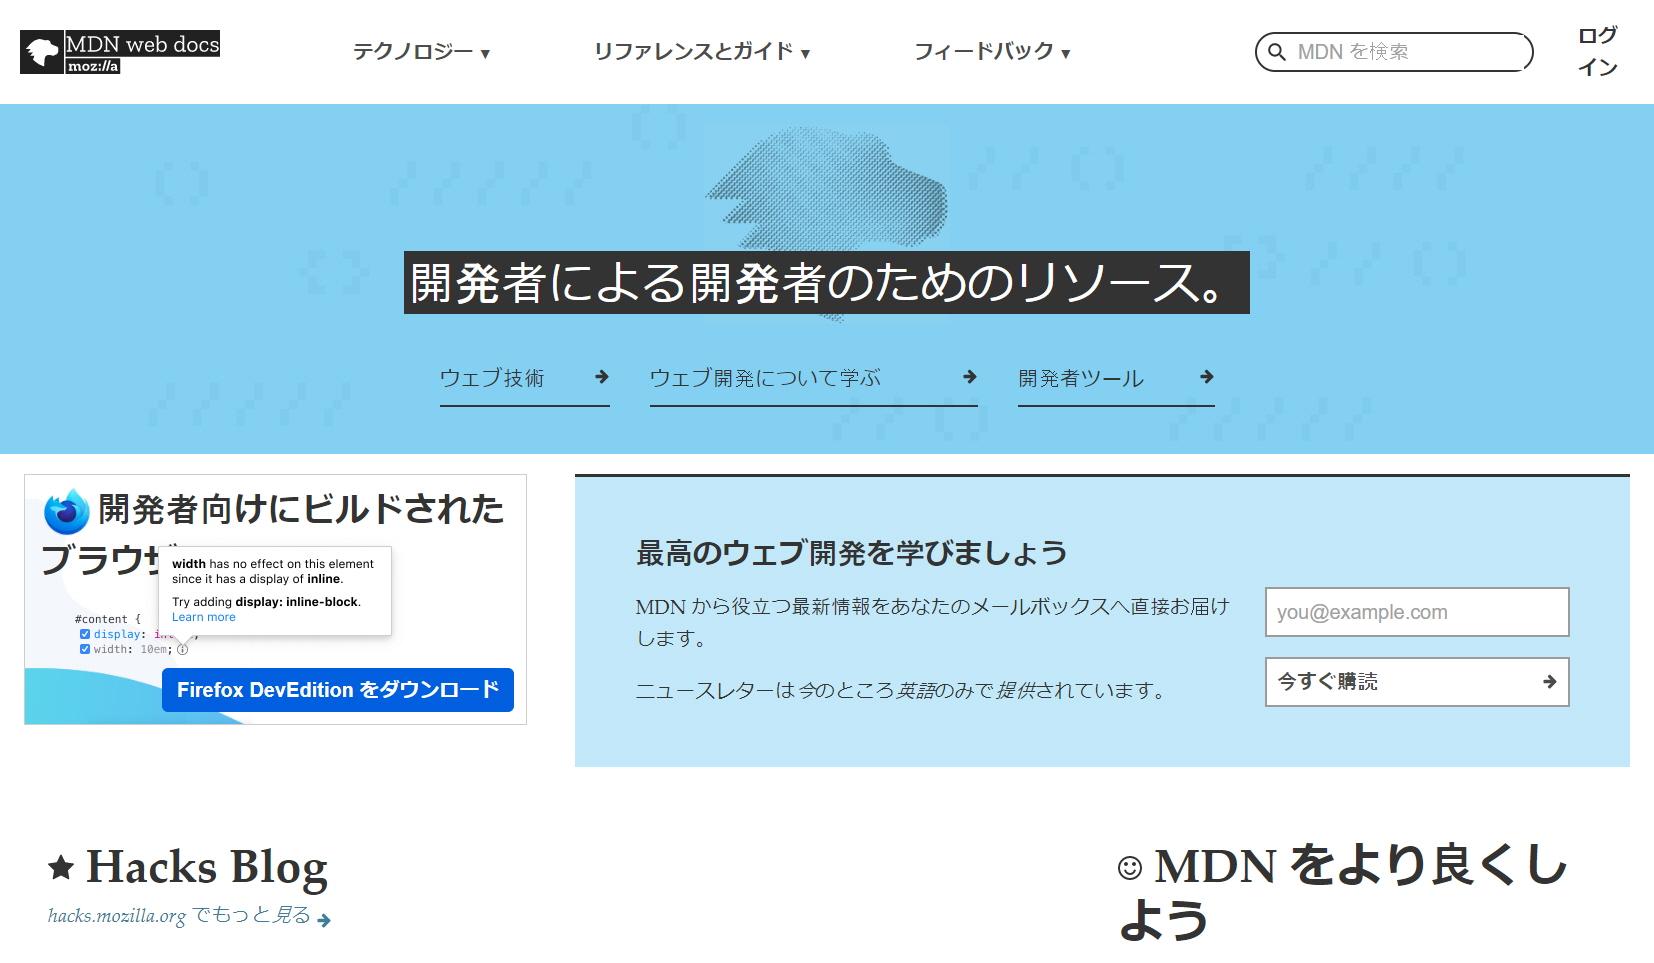 screencapture-developer-mozilla-org-ja-2020-07-15-18_57_06.jpg